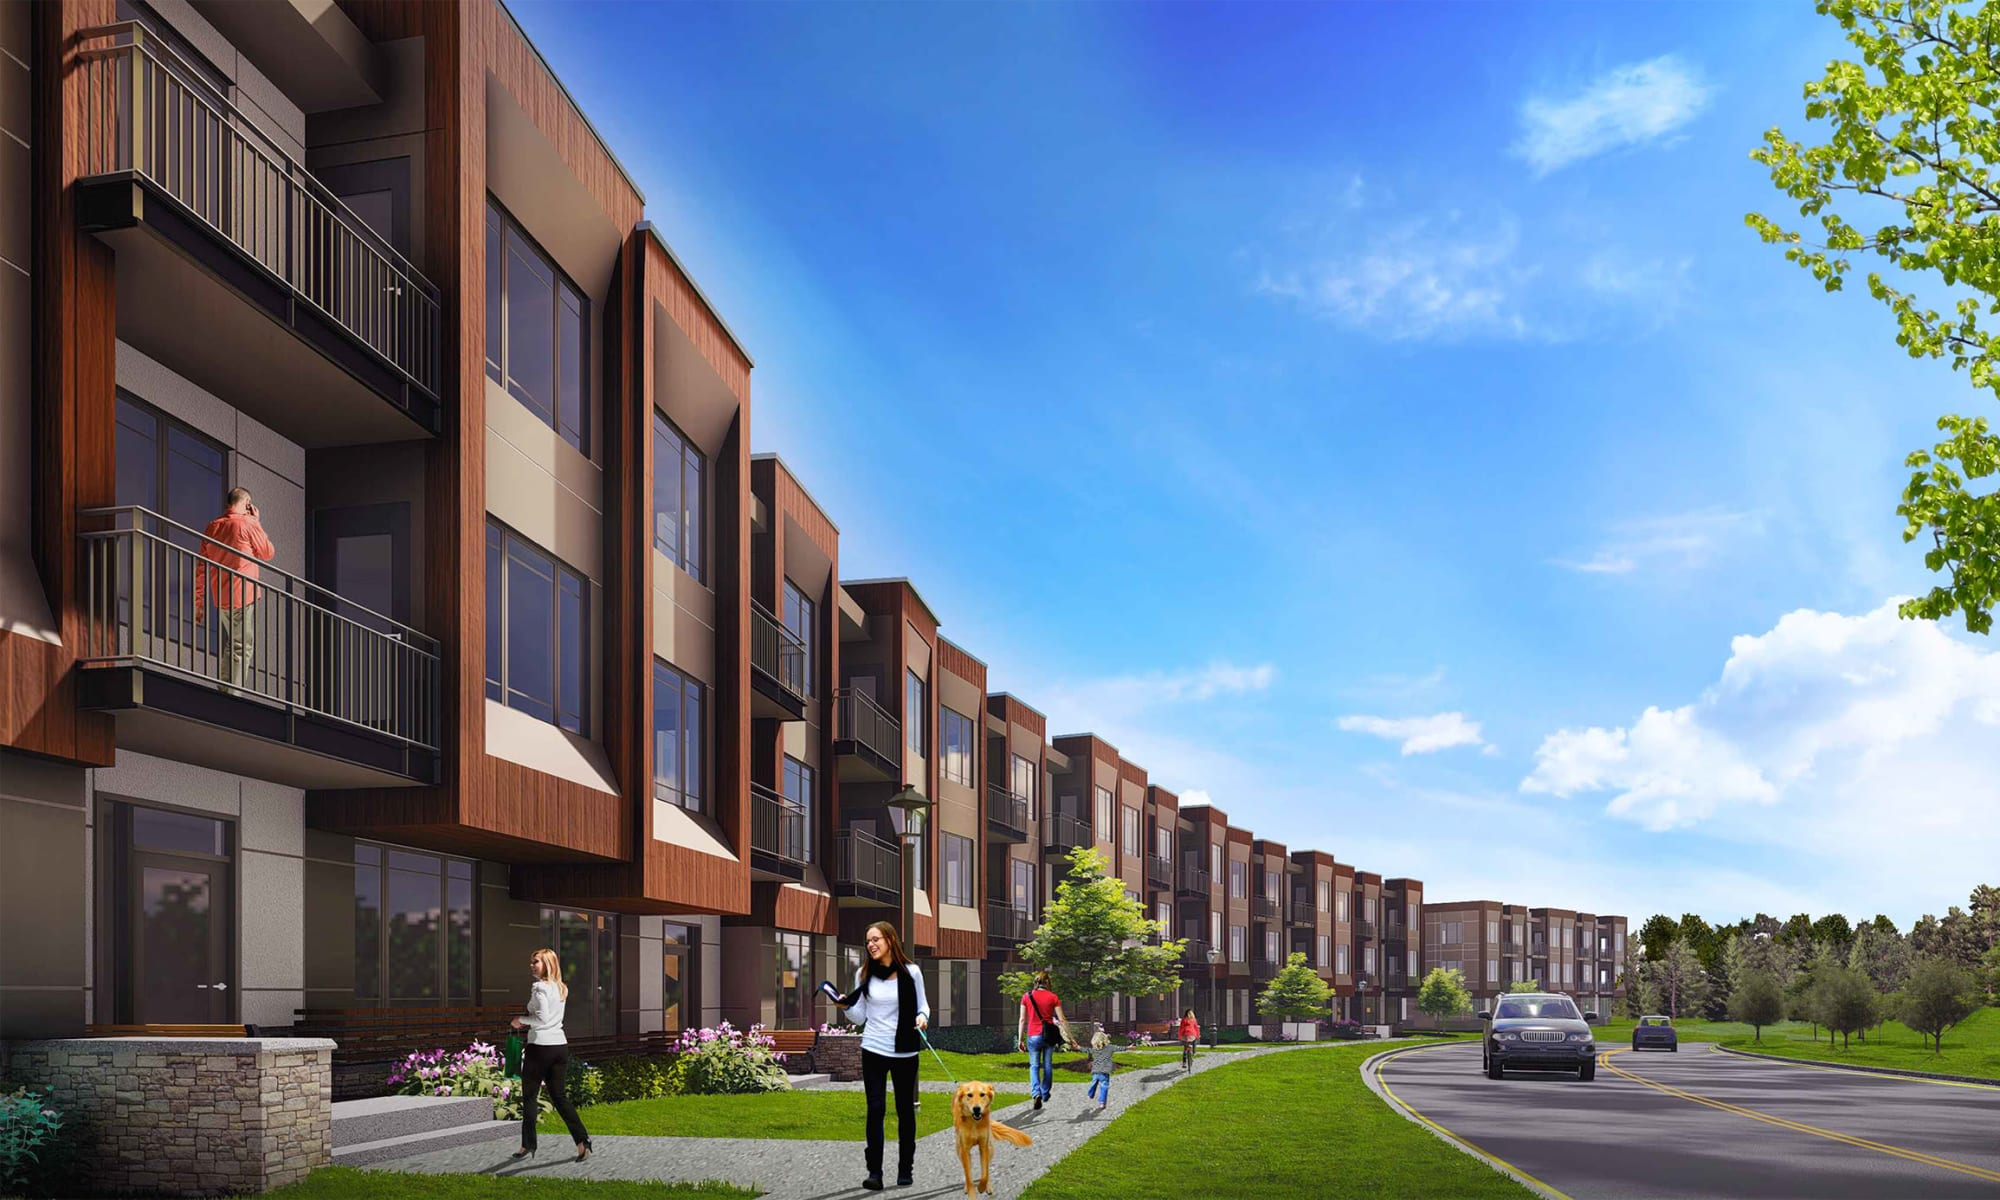 Apartments at Uptown Ann Arbor in Ann Arbor, Michigan